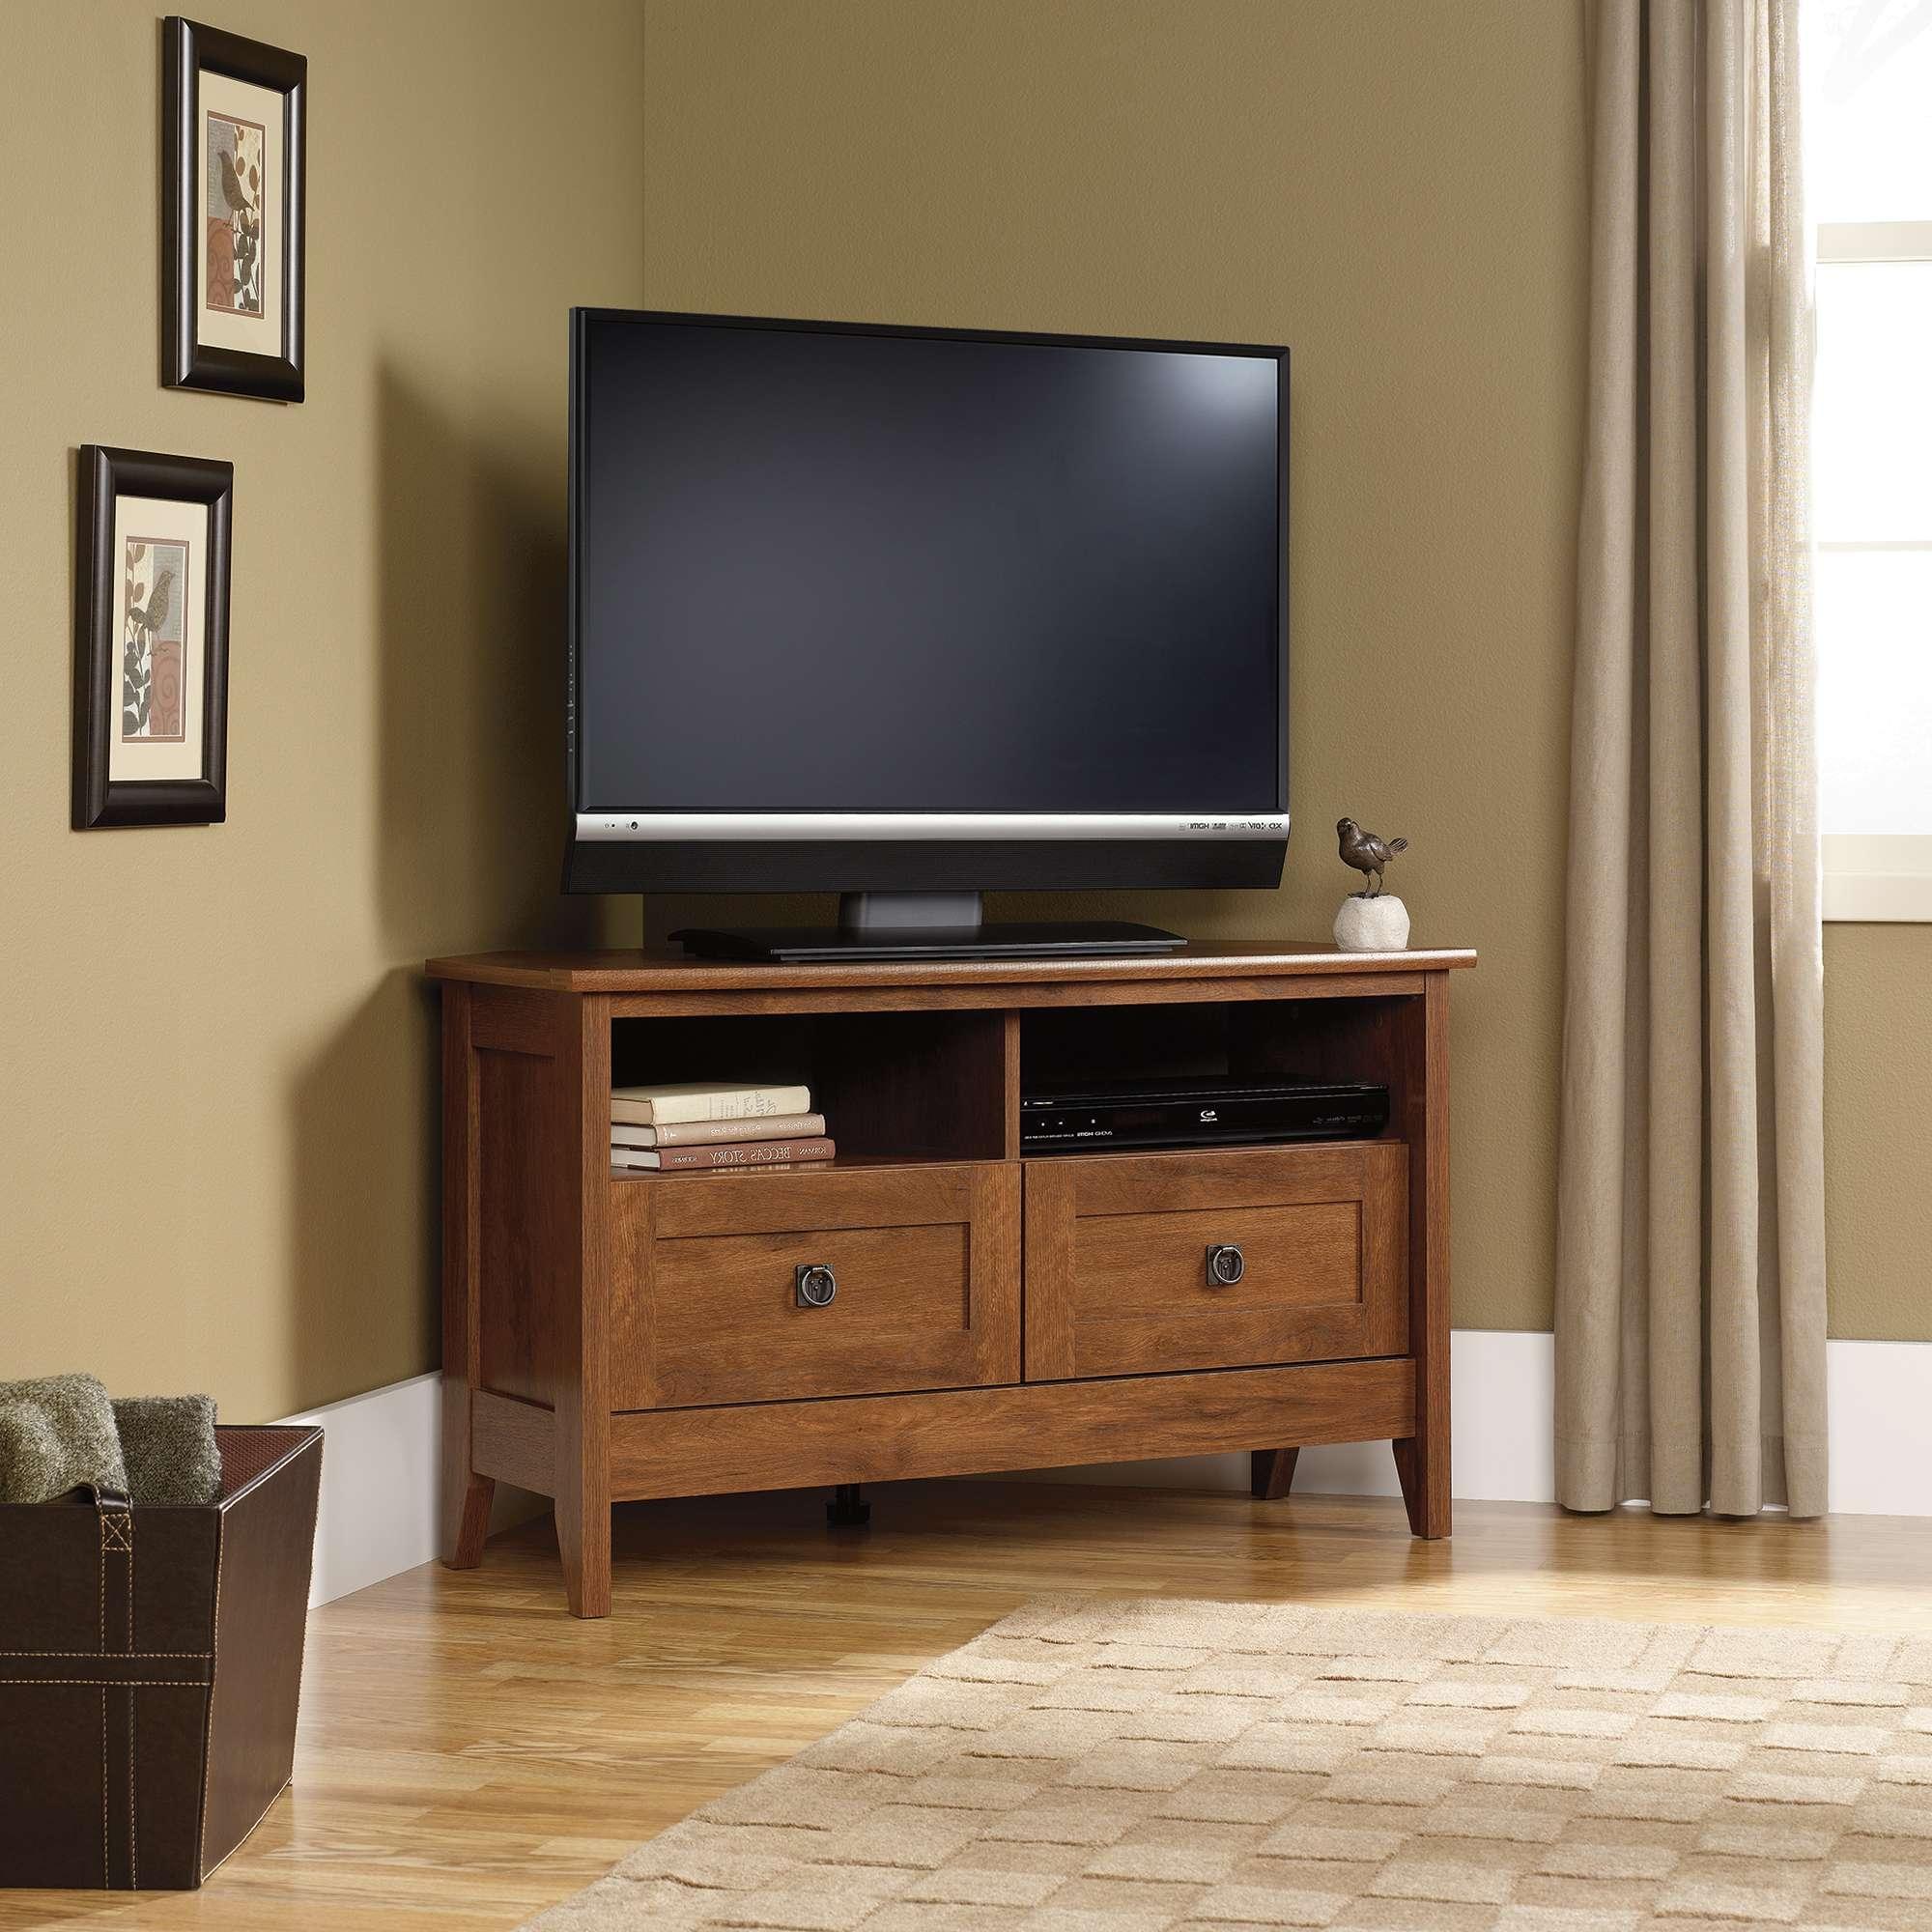 Sauder Select | Corner Tv Stand | 410627 | Sauder Inside Dark Wood Corner Tv Cabinets (View 16 of 20)